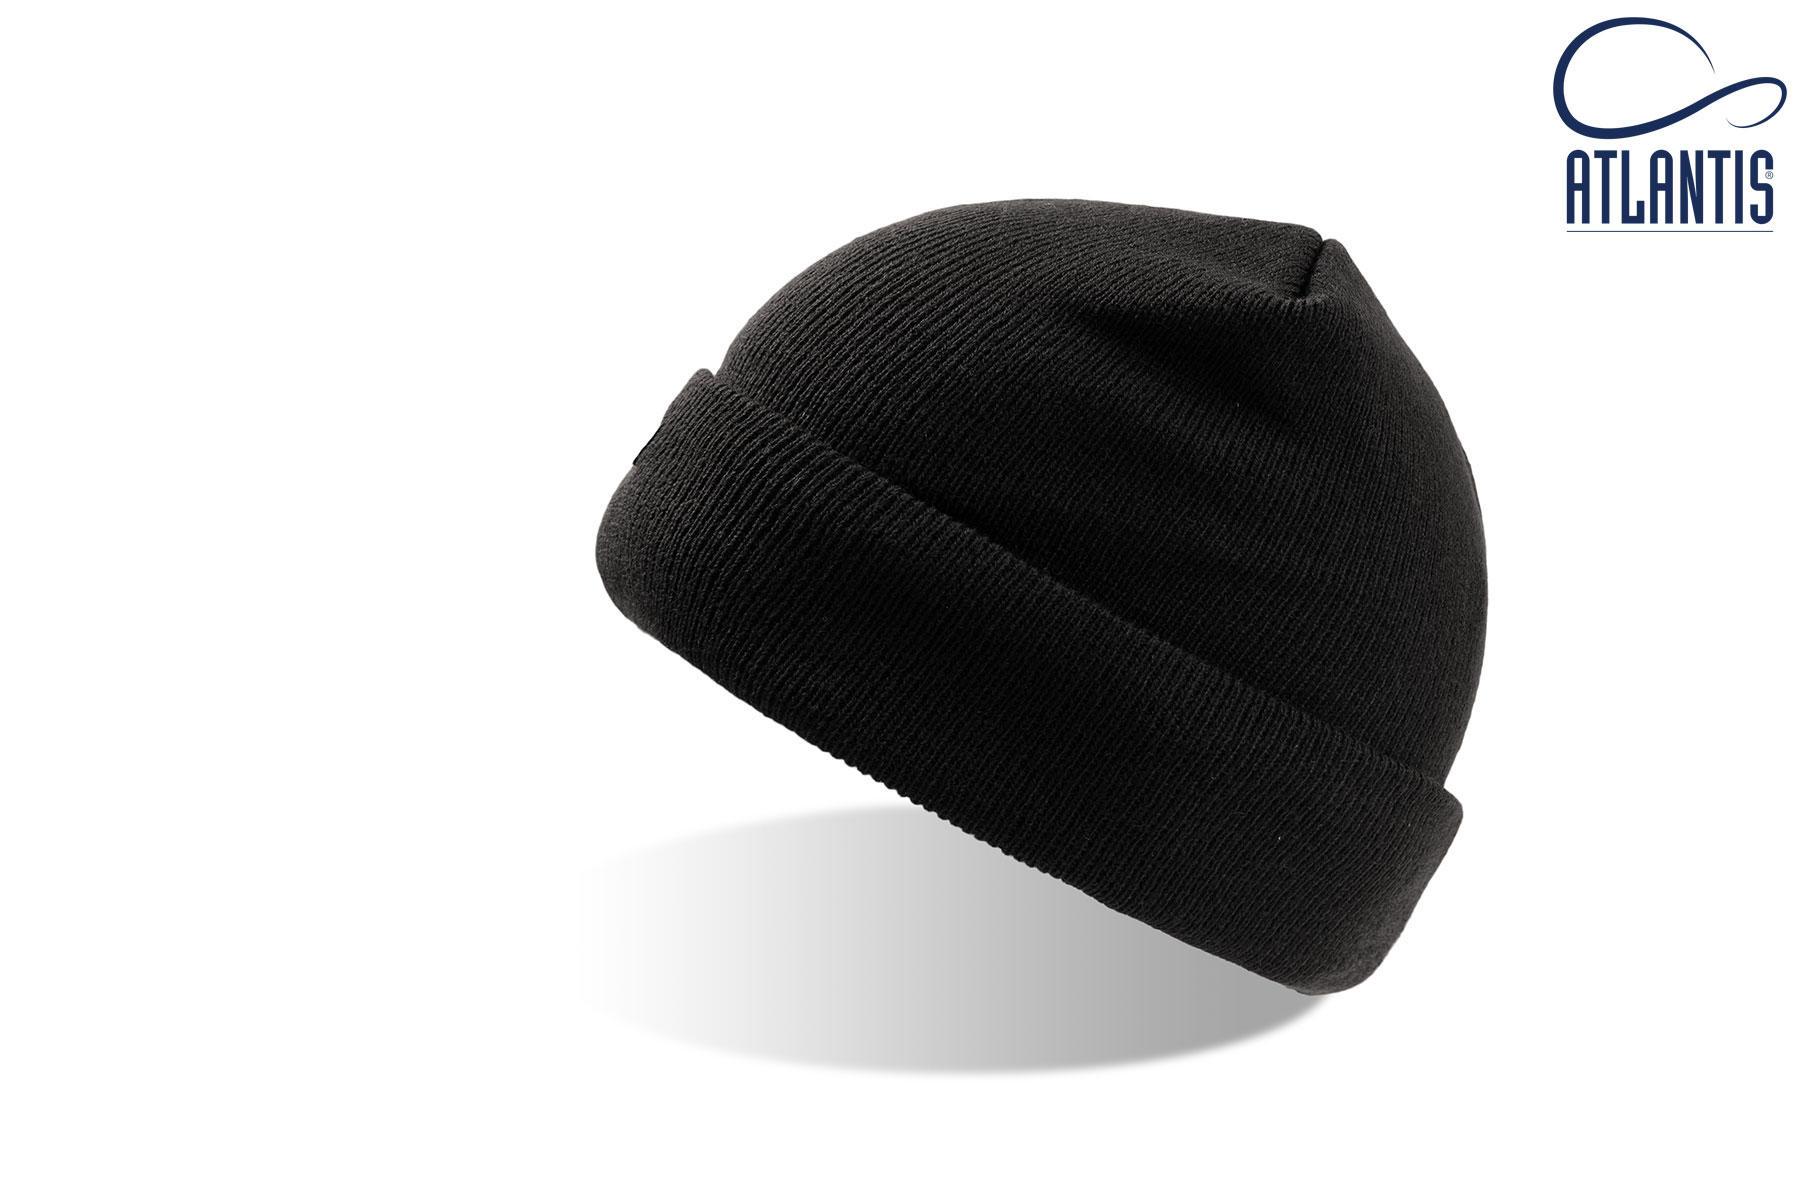 zimske kape pier thinsulate crna